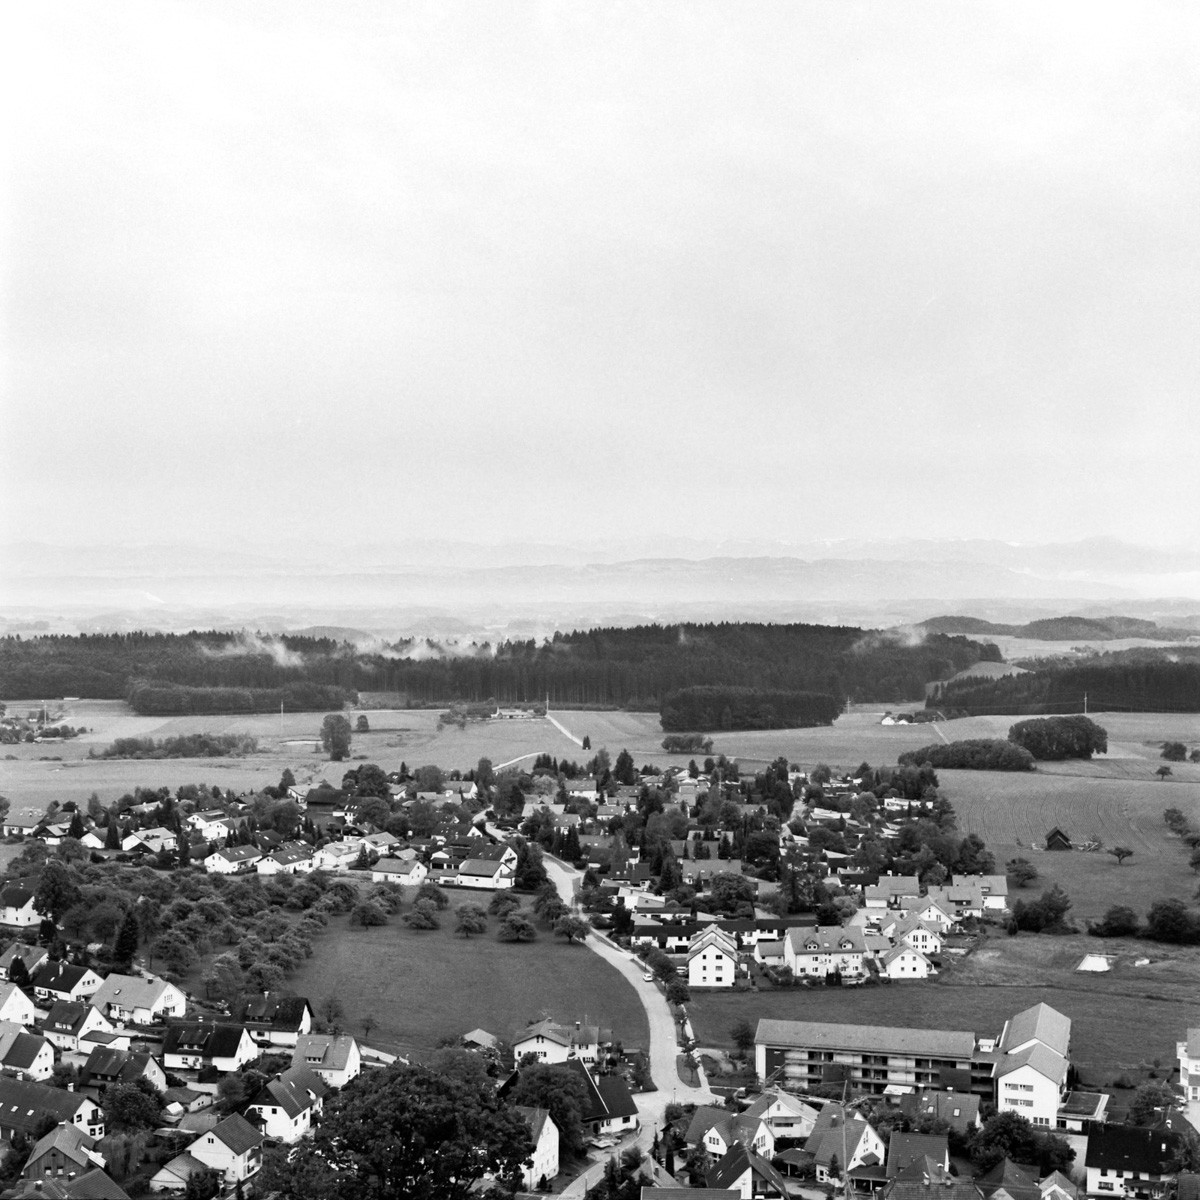 Ravensburg, Germany - Hasselblad 501CM,Kodak Tri-X 400